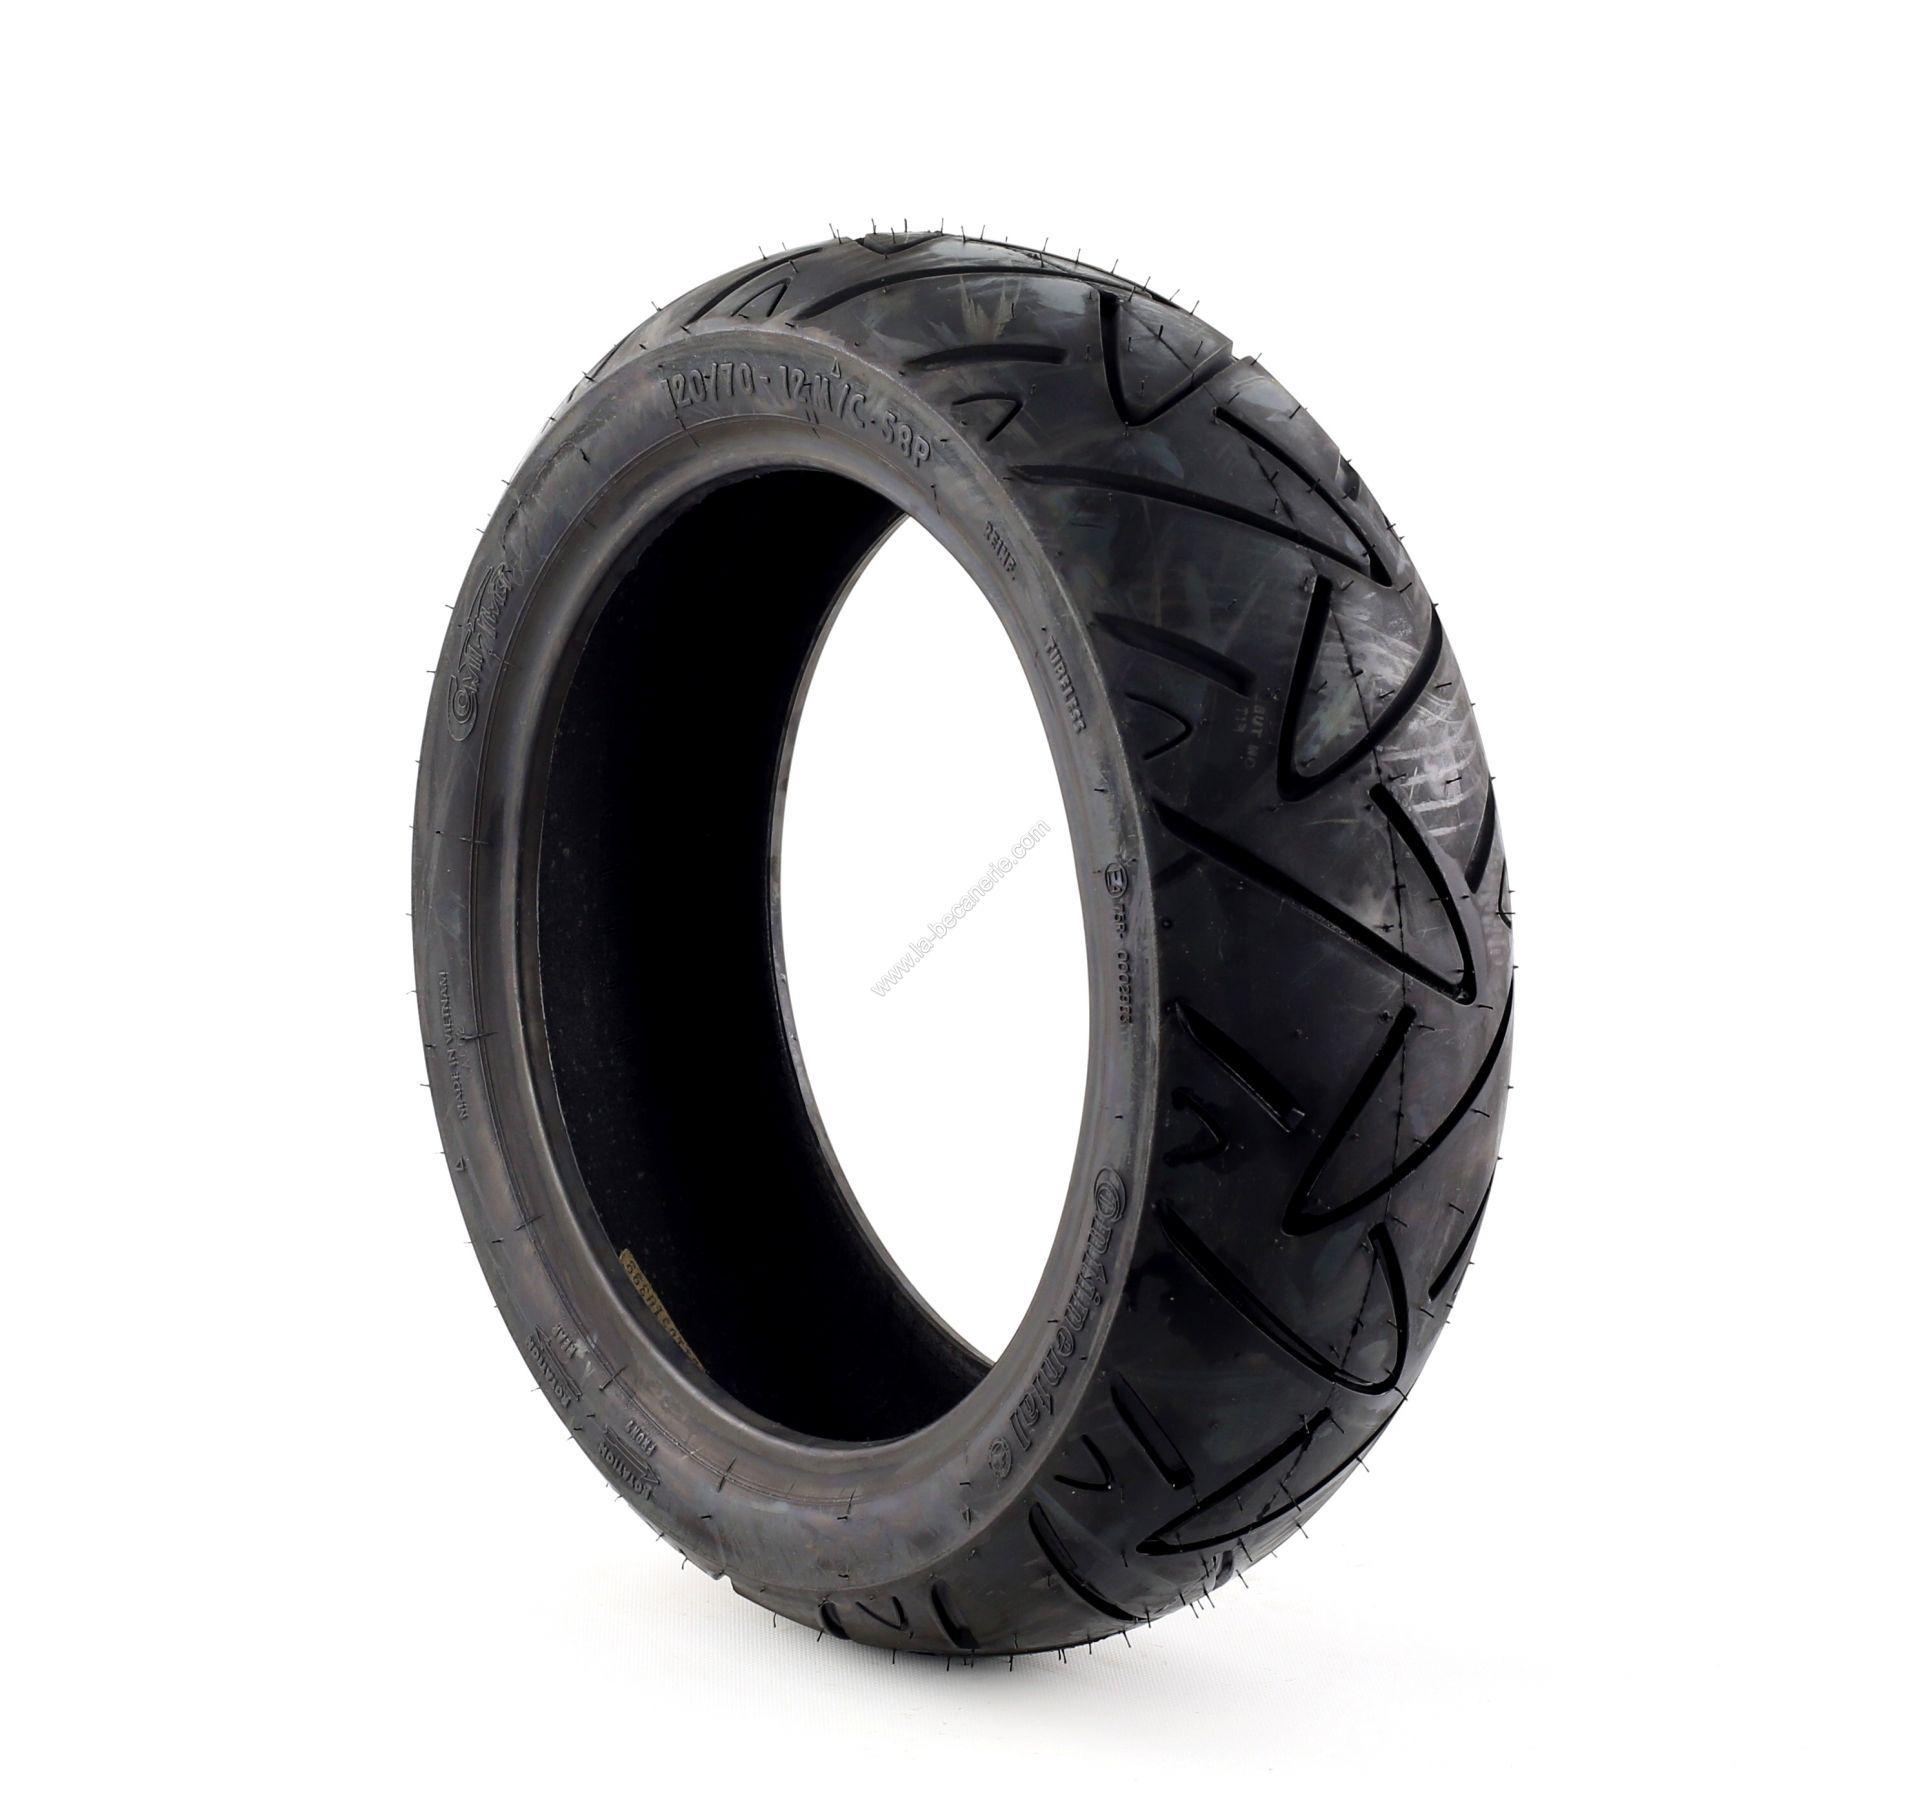 pneus continental scooter la b canerie. Black Bedroom Furniture Sets. Home Design Ideas